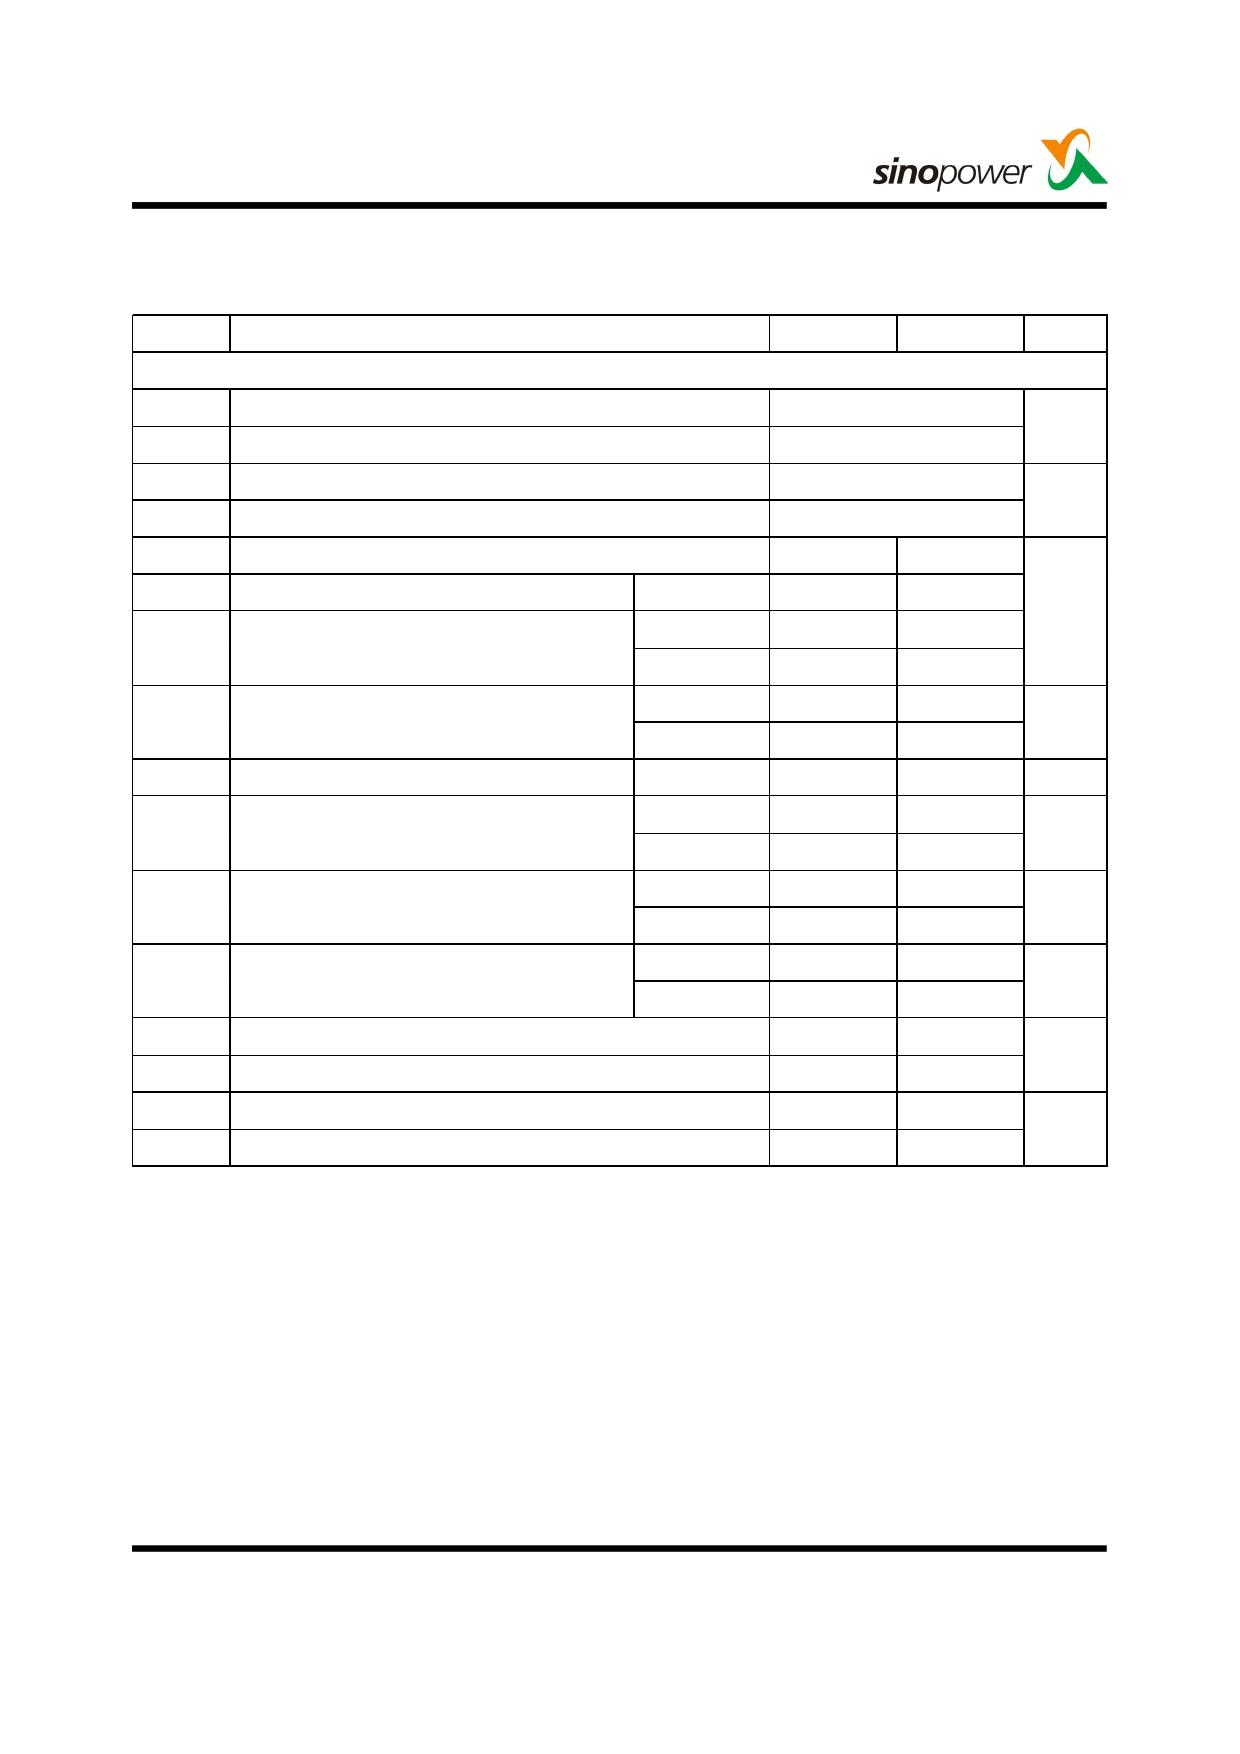 SM7303ESKP pdf, schematic